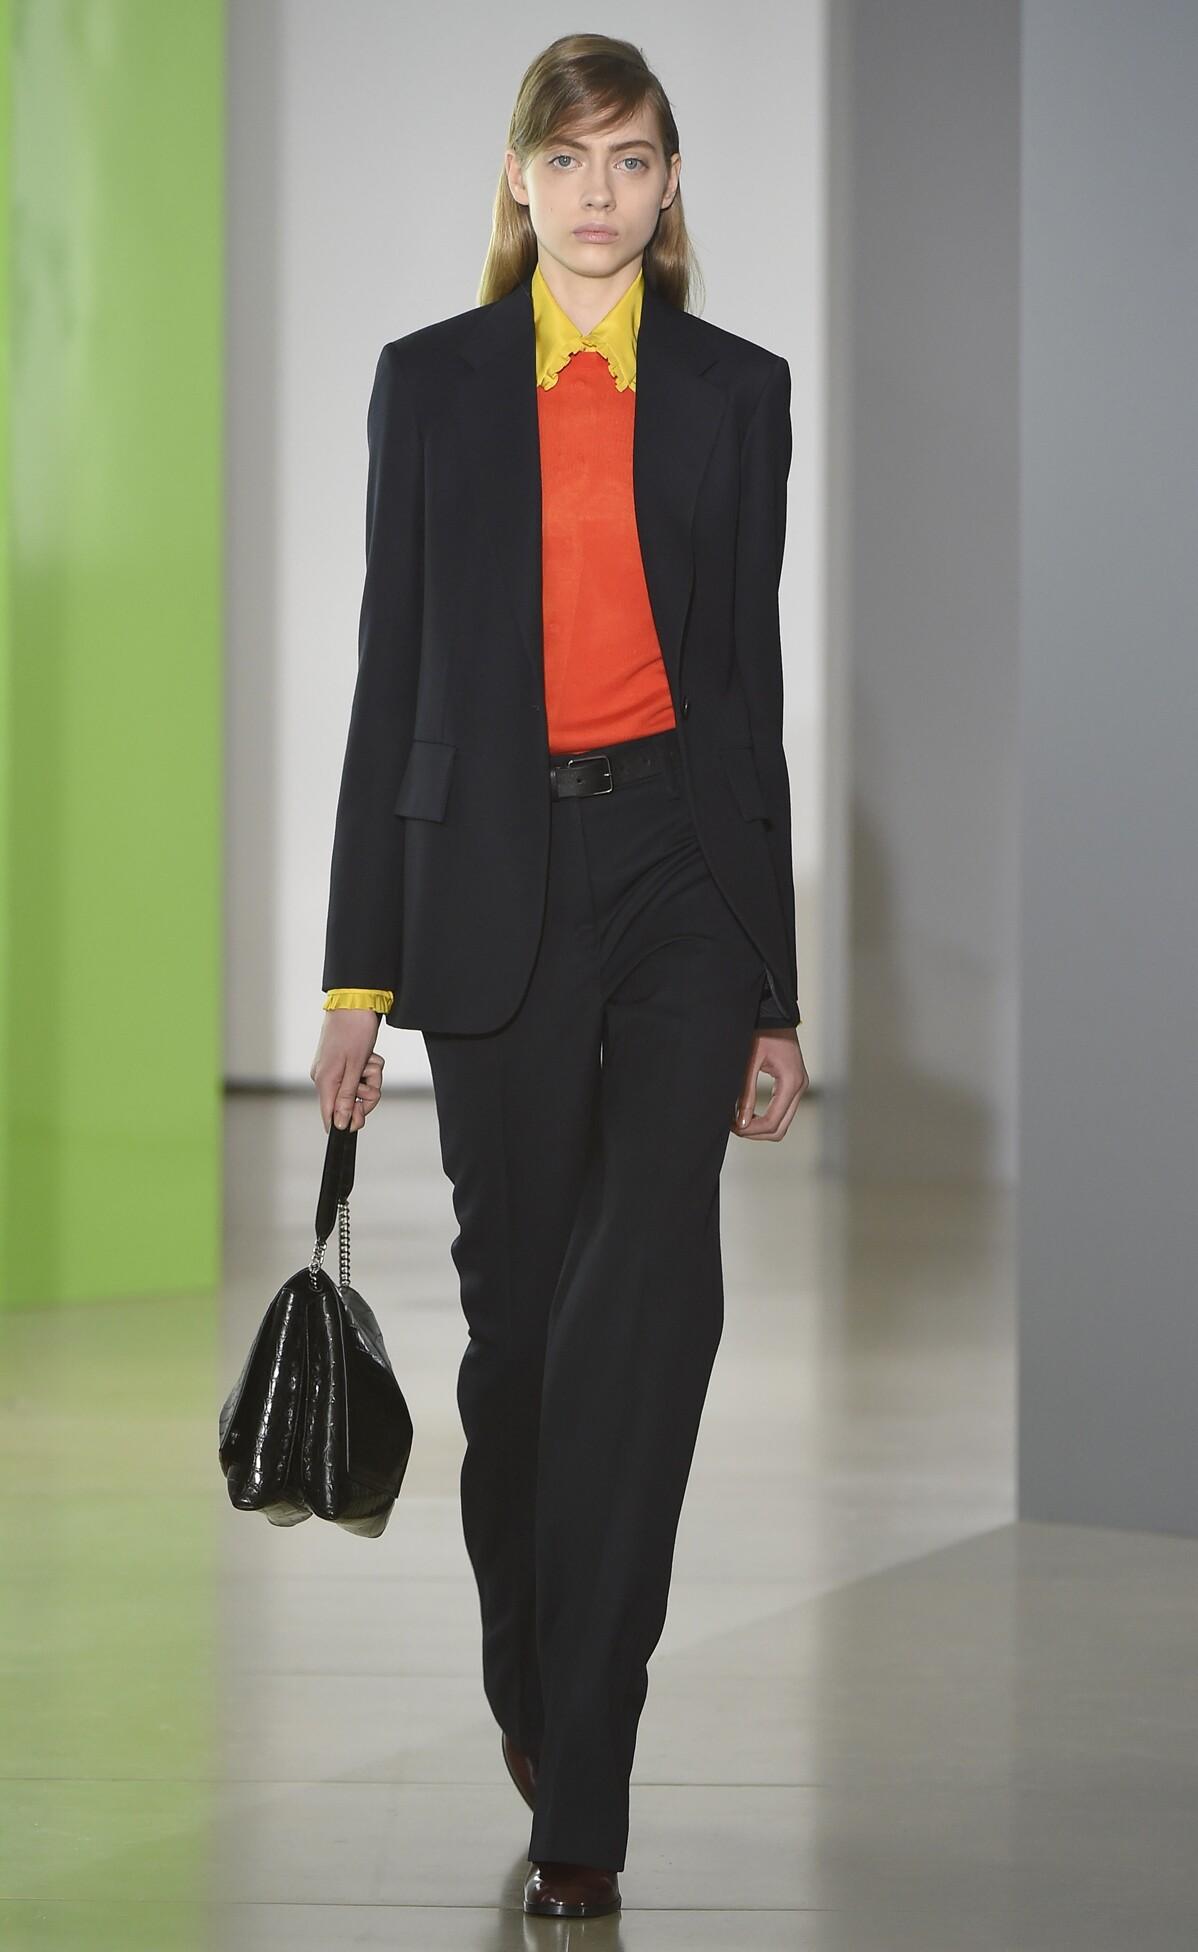 Jil Sander Fall Winter 2015 16 Womens Collection Milan Fashion Week